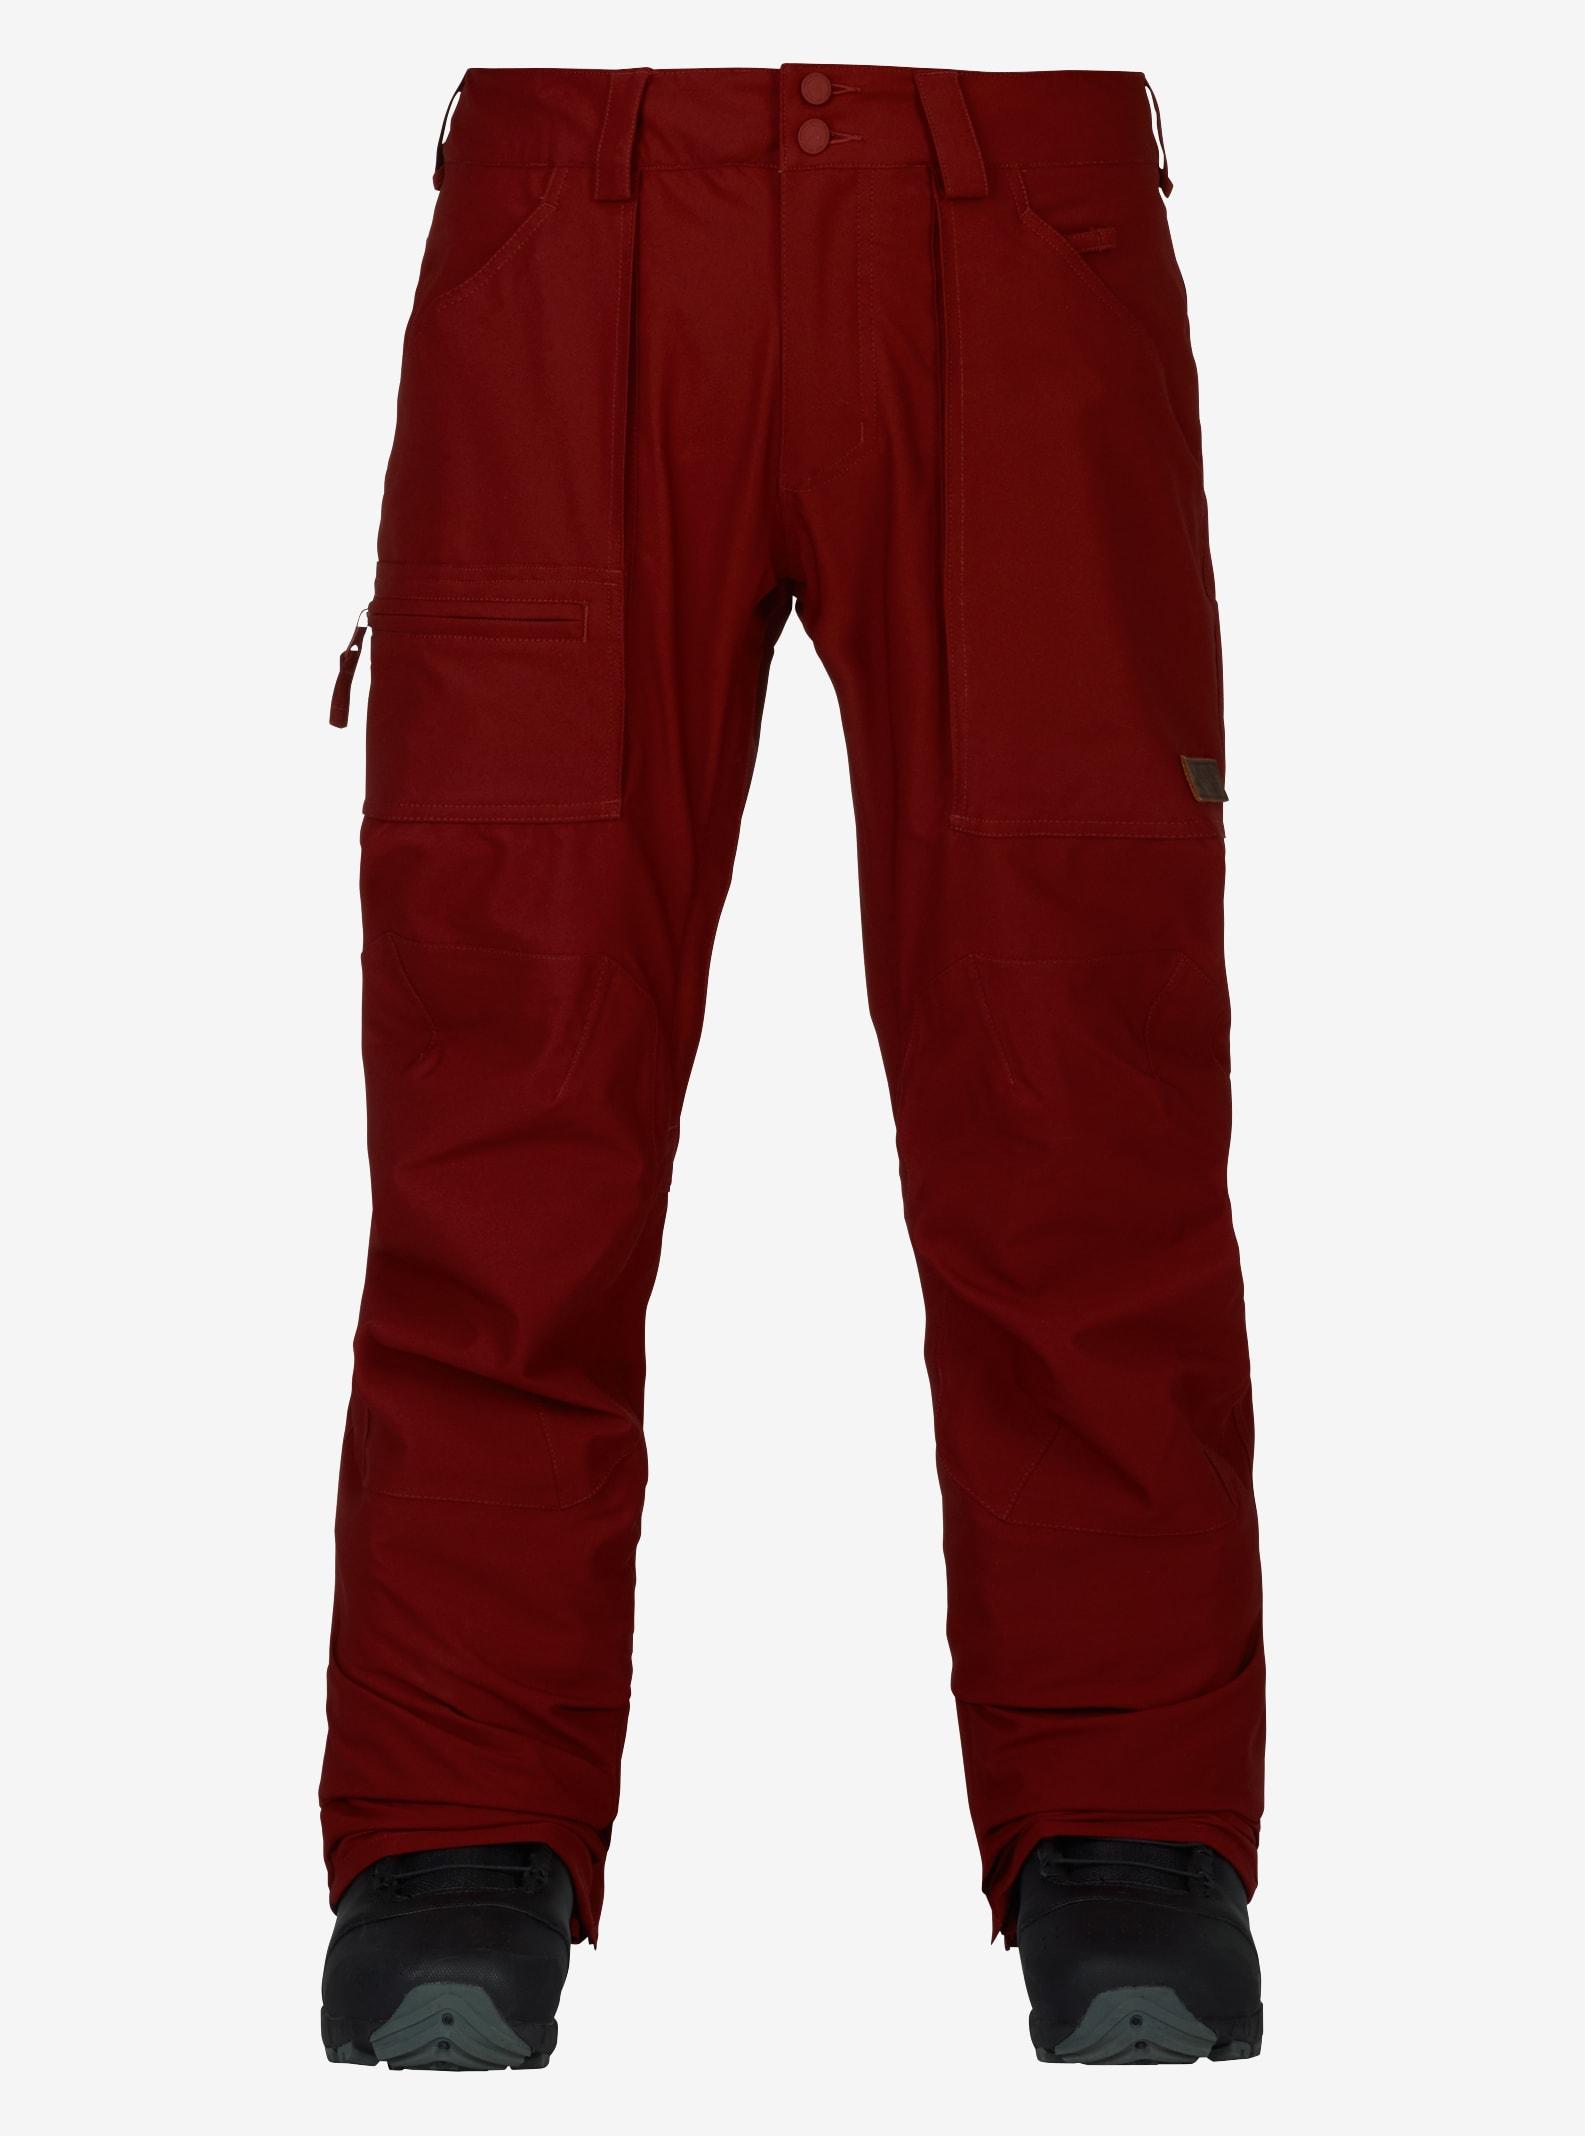 Men's Burton Southside Pant - Slim Fit shown in Fired Brick